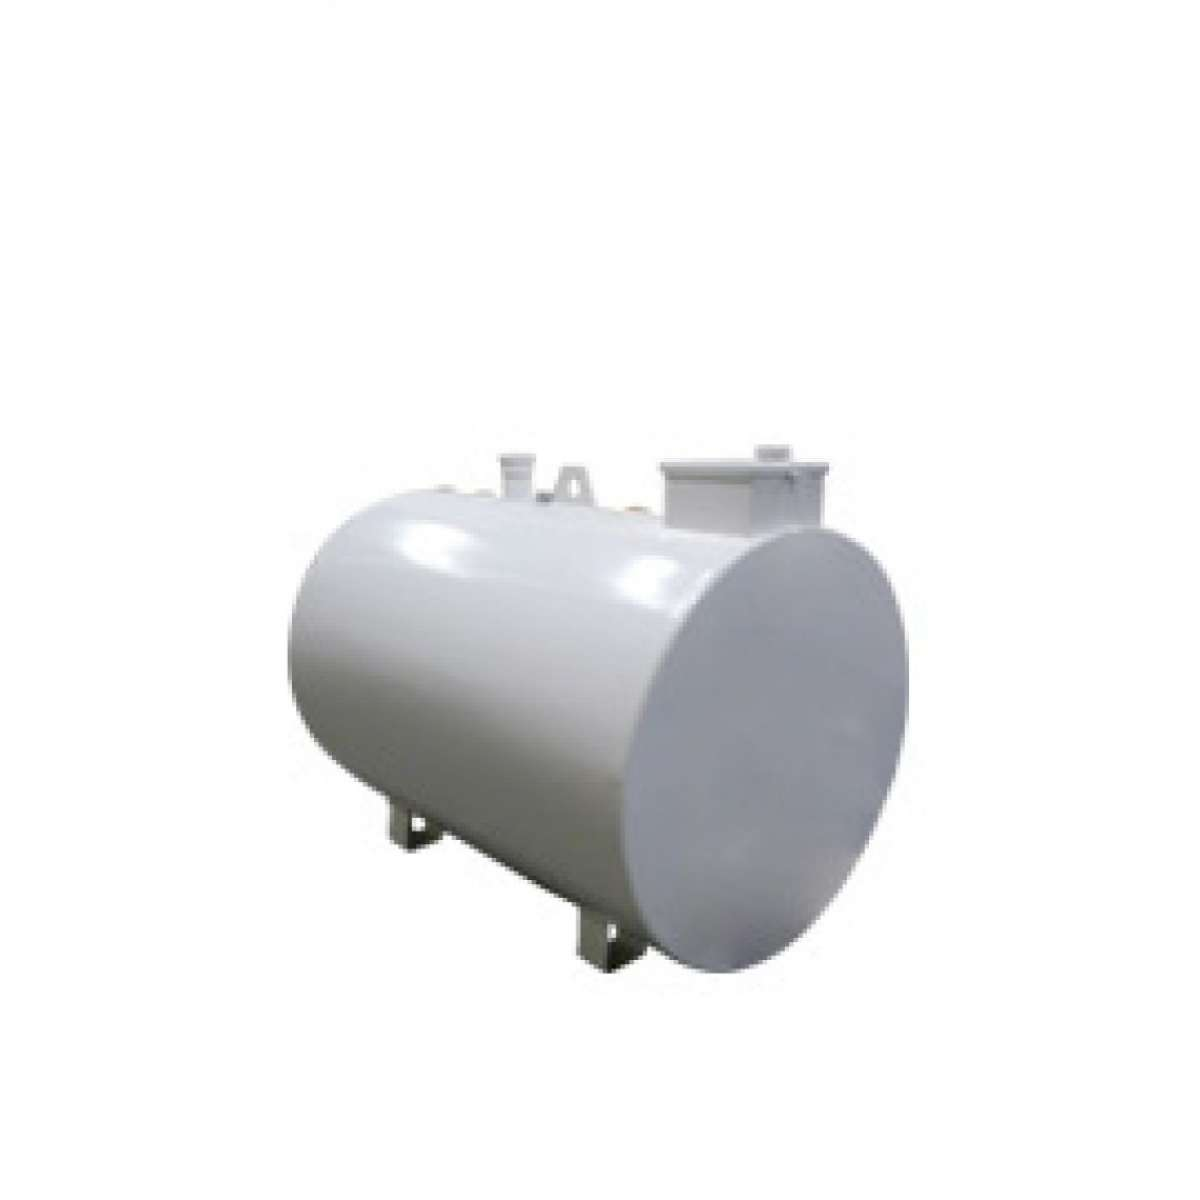 1100 Litre 250 Gallon  Aboveground Used Oil Storage Tank